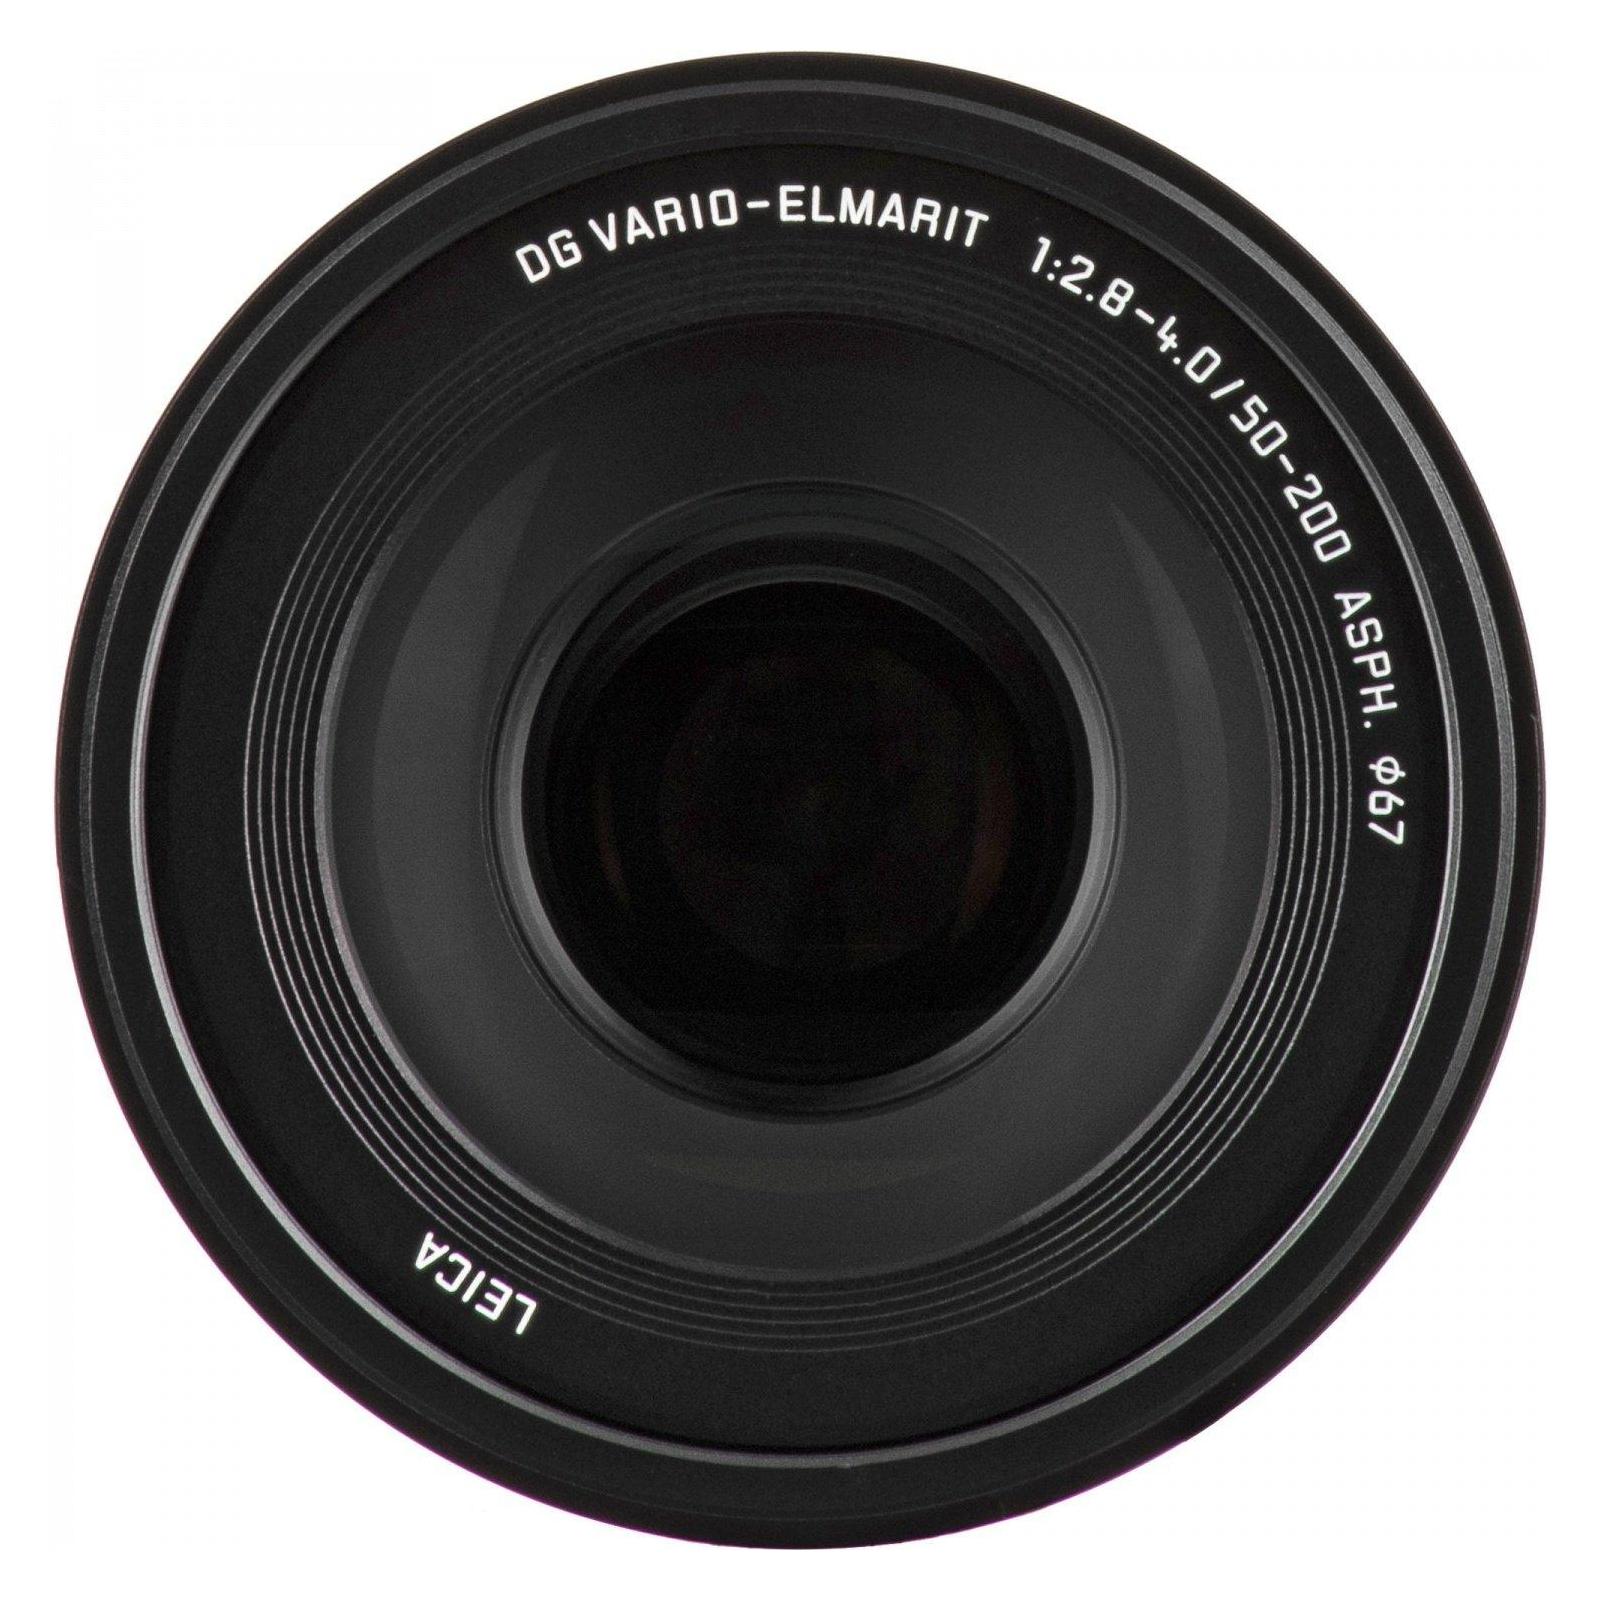 Объектив PANASONIC Micro 4/3 Lens 50-200 mm f/2.8-4 ASPH. POWER O.I.S. Leica DG (H-ES50200E) изображение 8